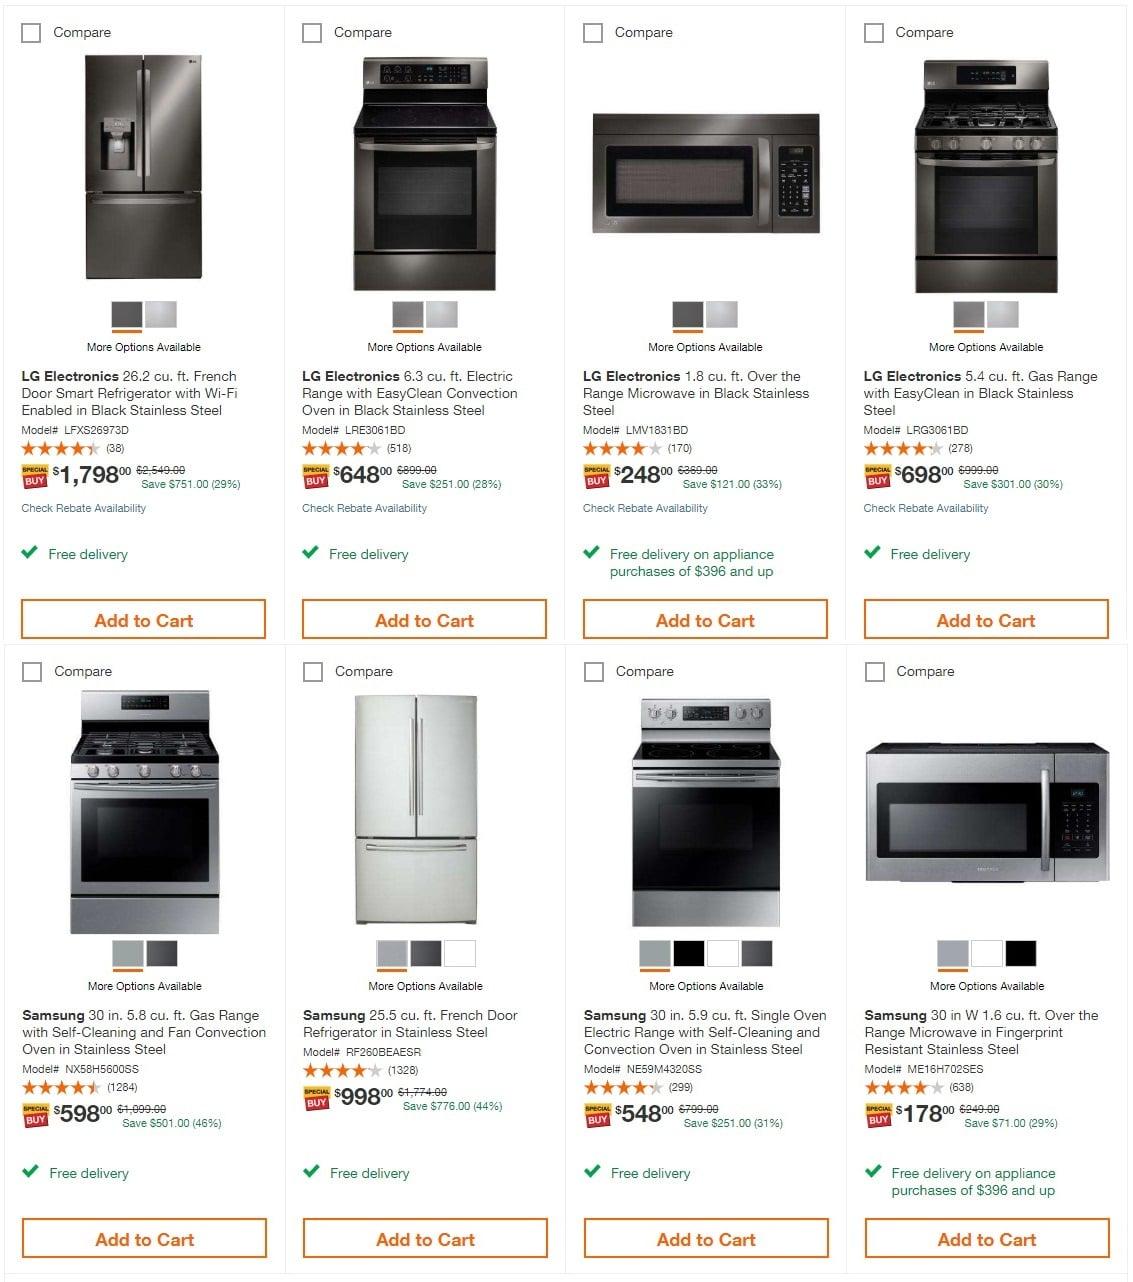 Home Depot Black Friday Appliance Savings Ad 2018